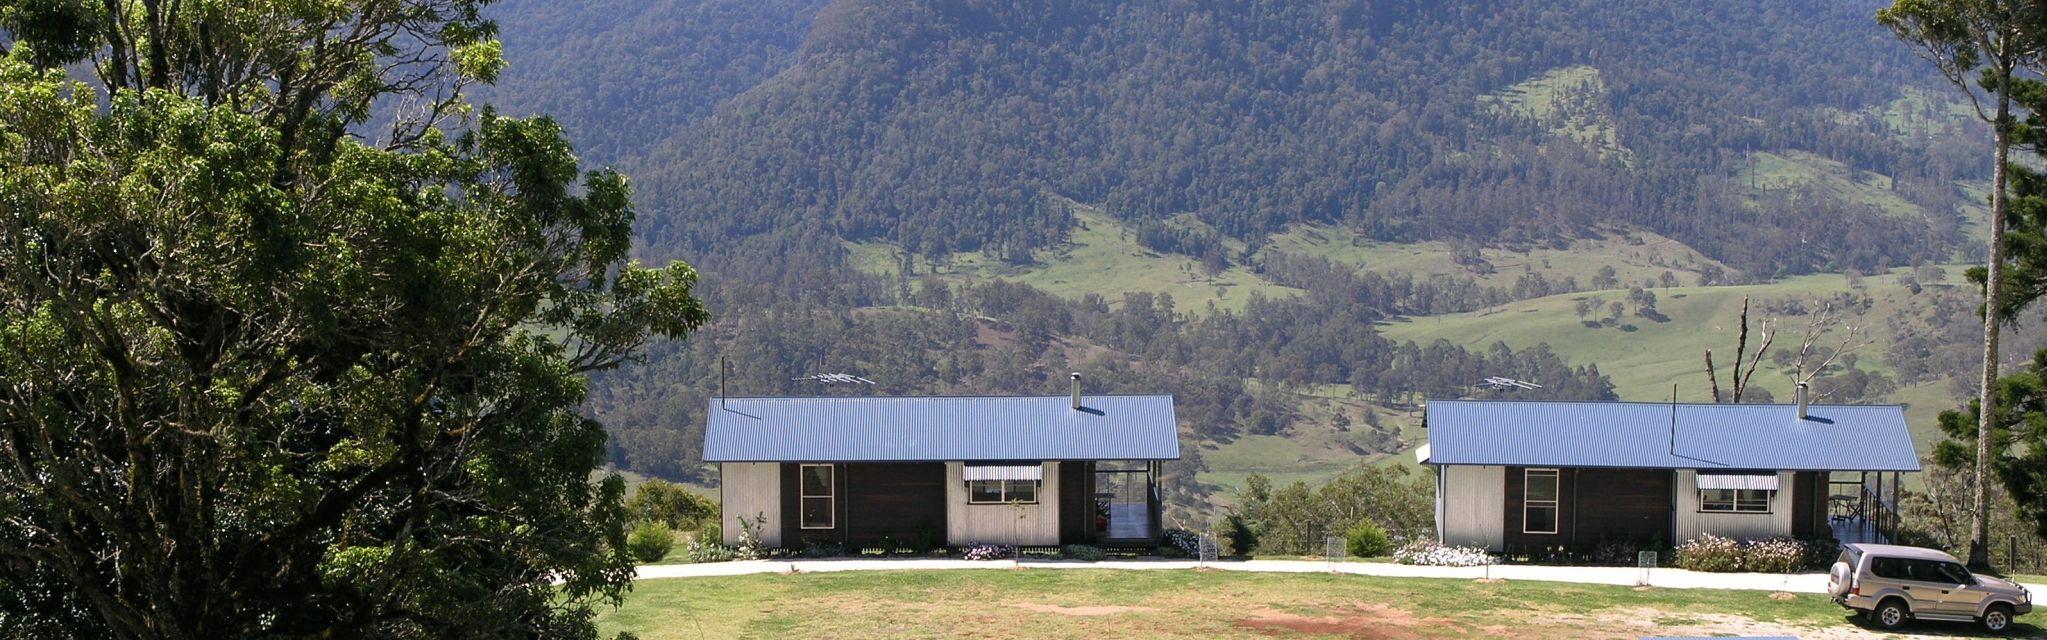 Spring Creek Cottages on our Border Ranges Short Break Tour